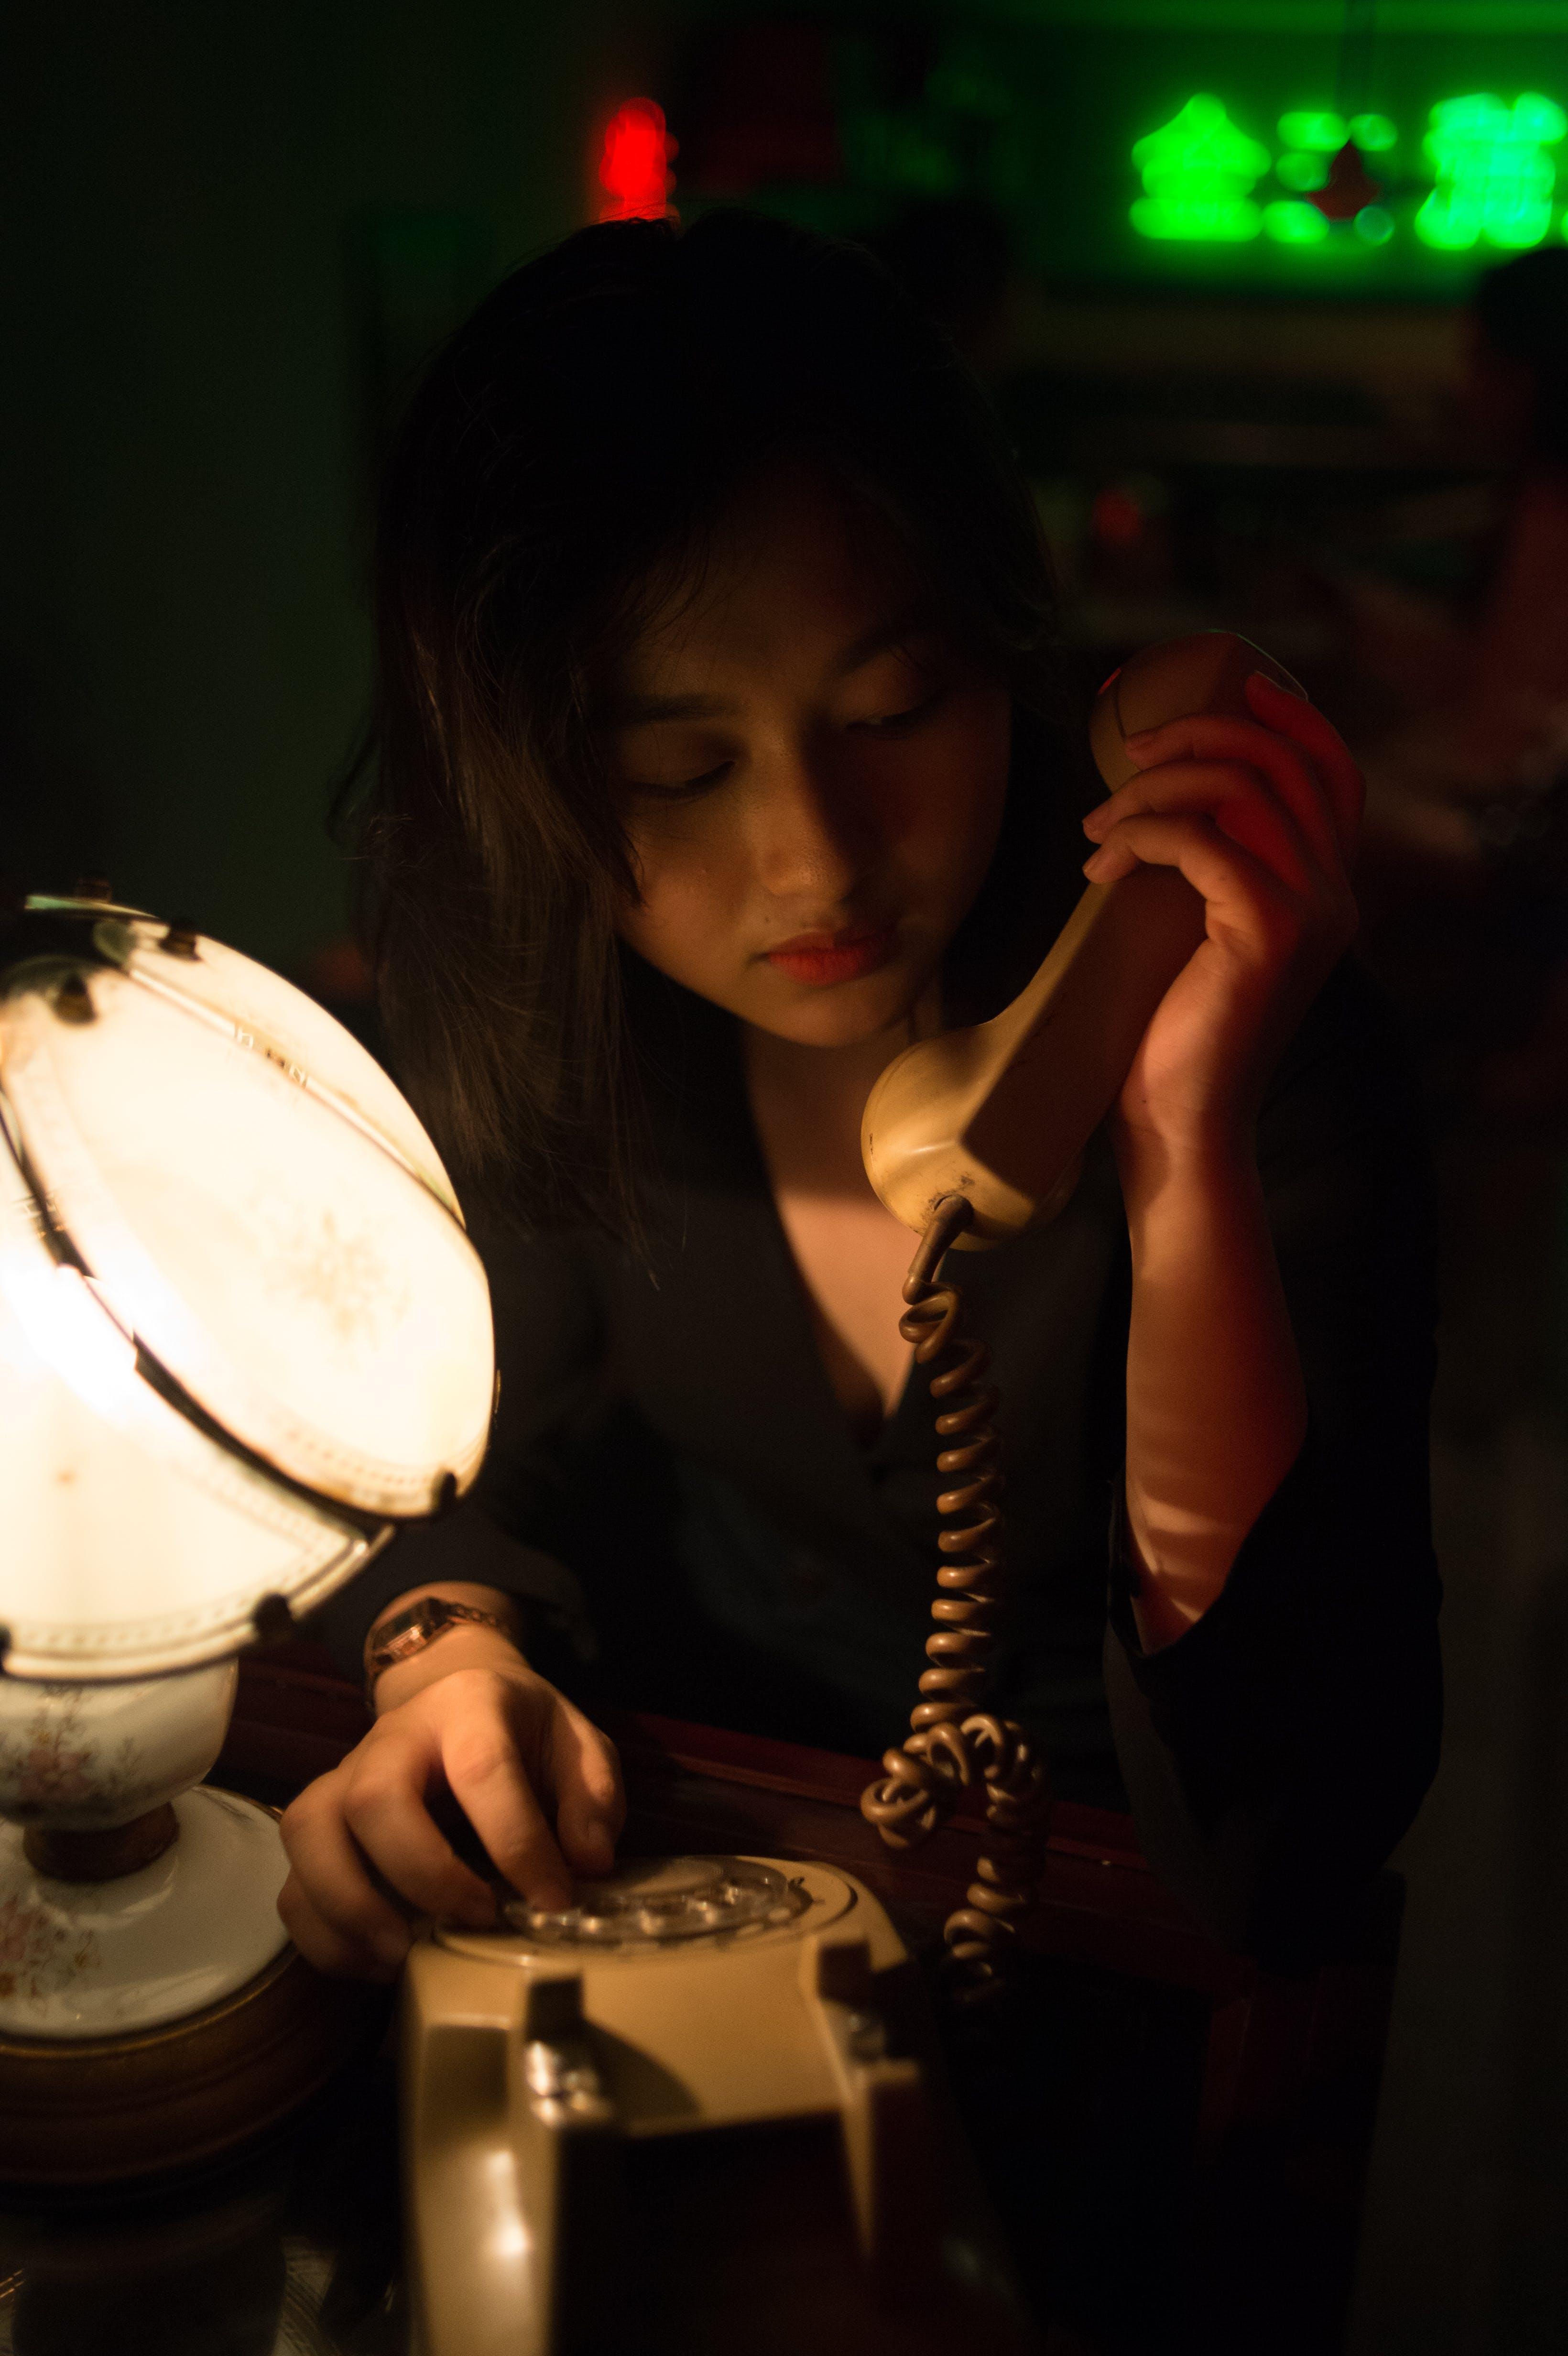 Woman Holding Telephone